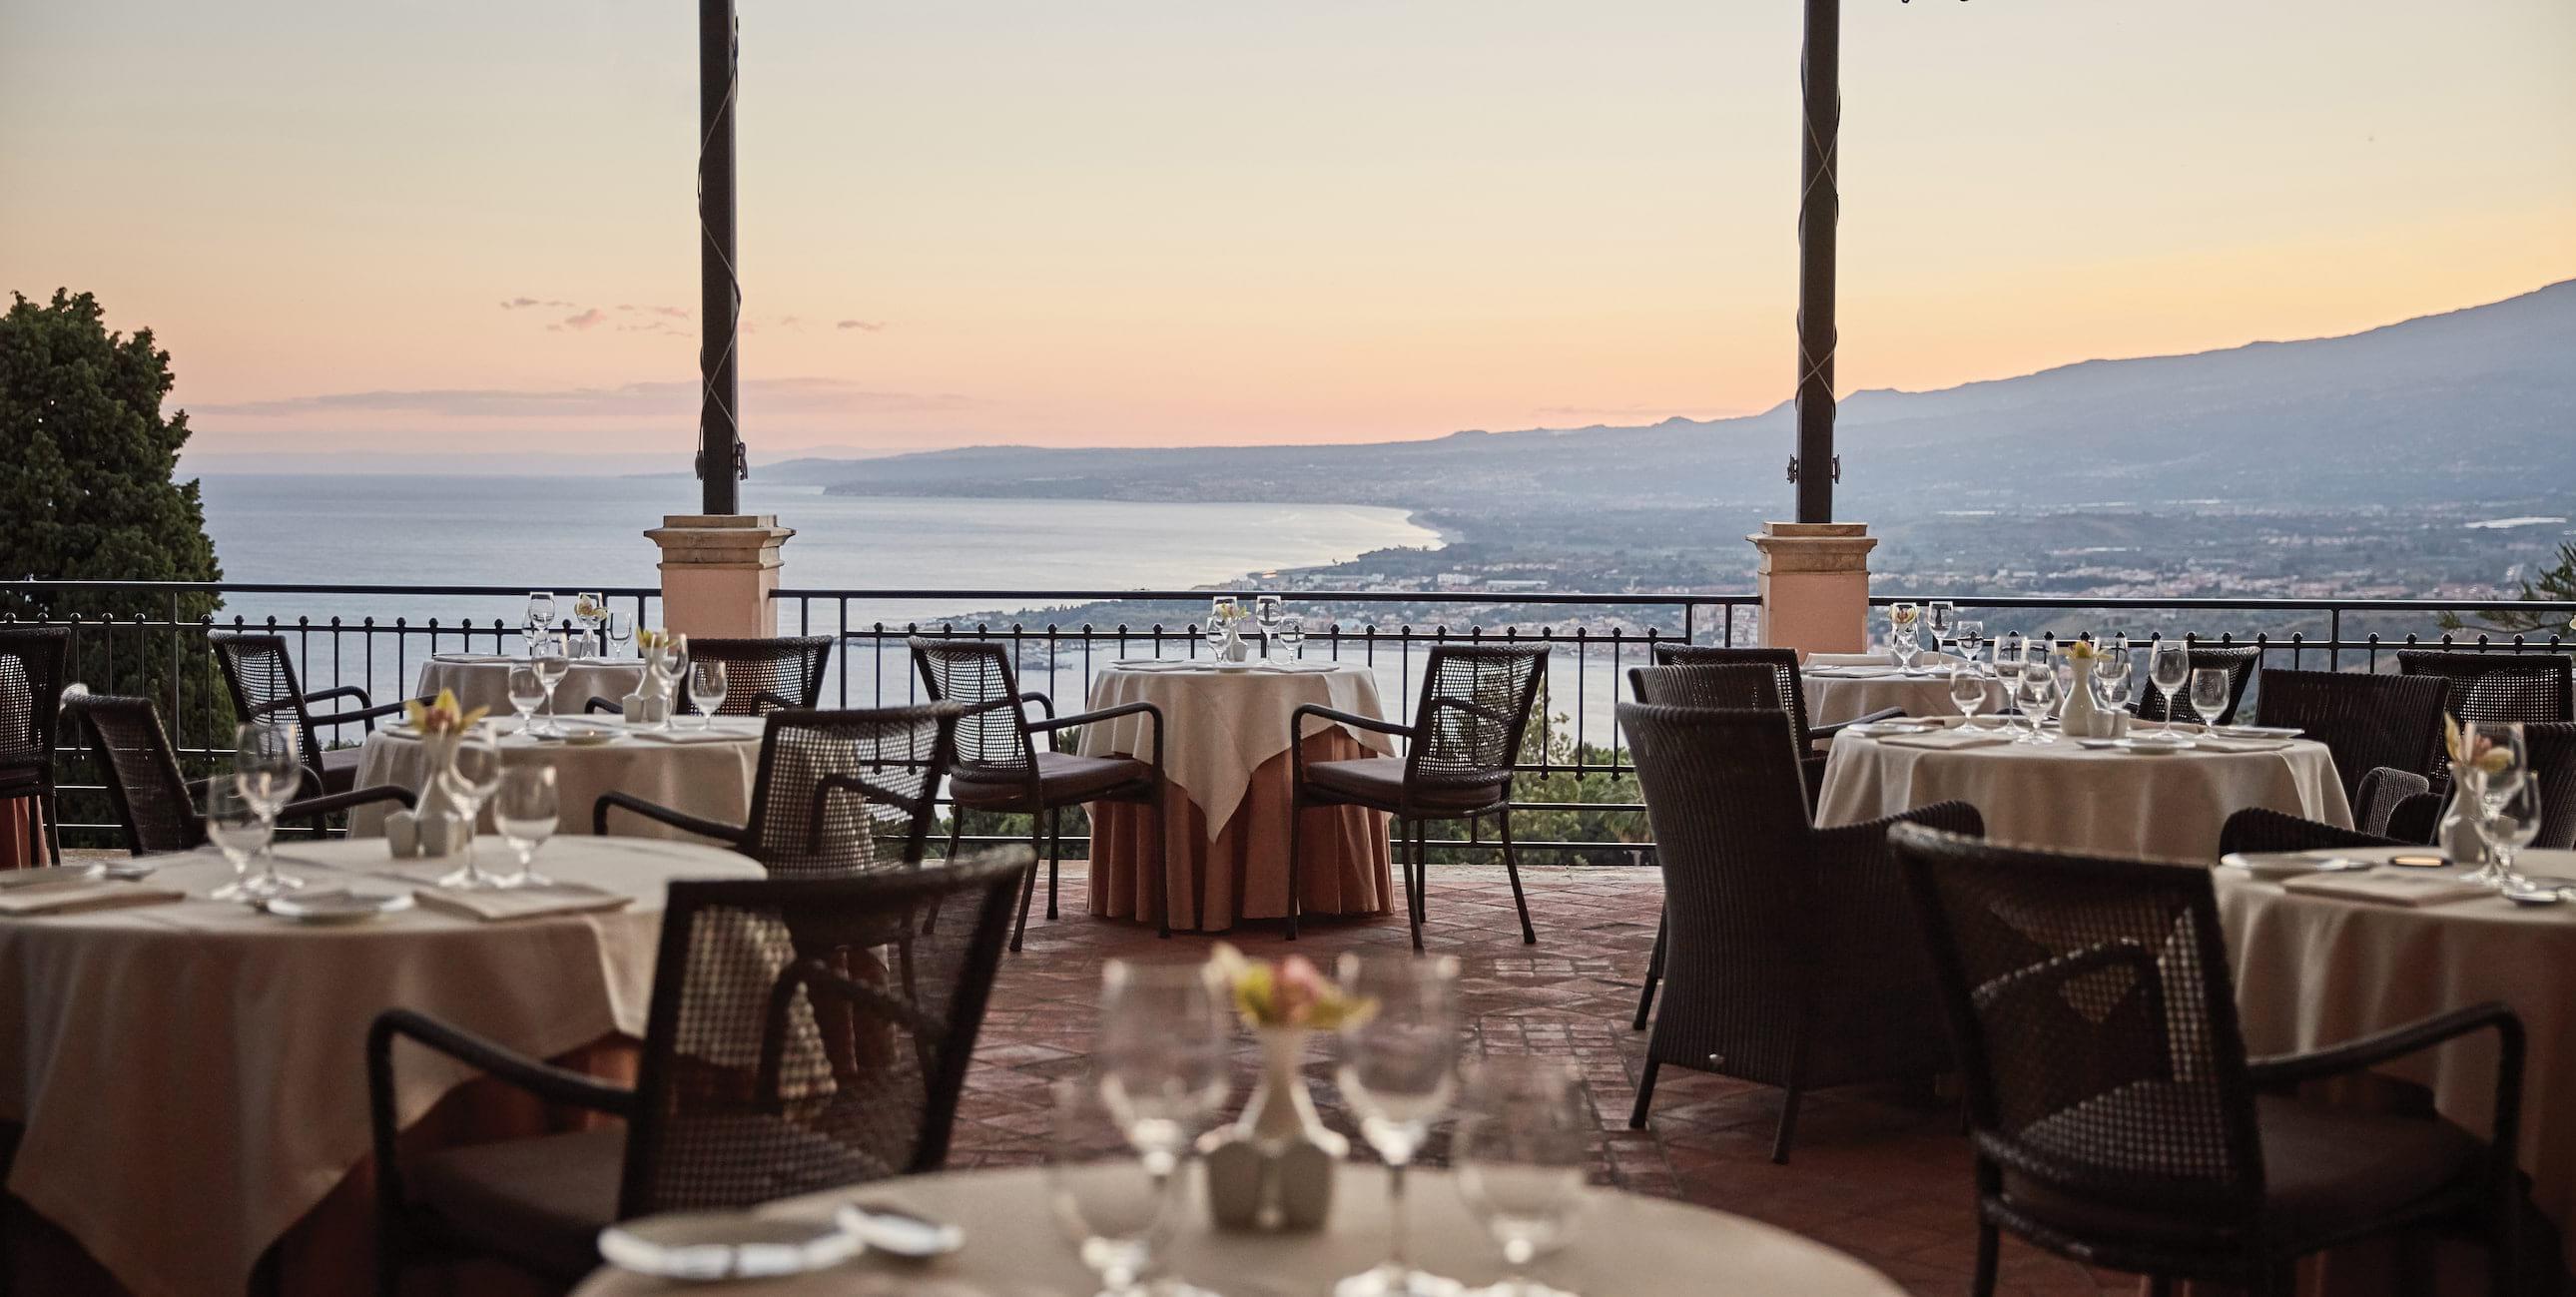 Best Restaurant Taormina Bars With Stunning Views In Sicily